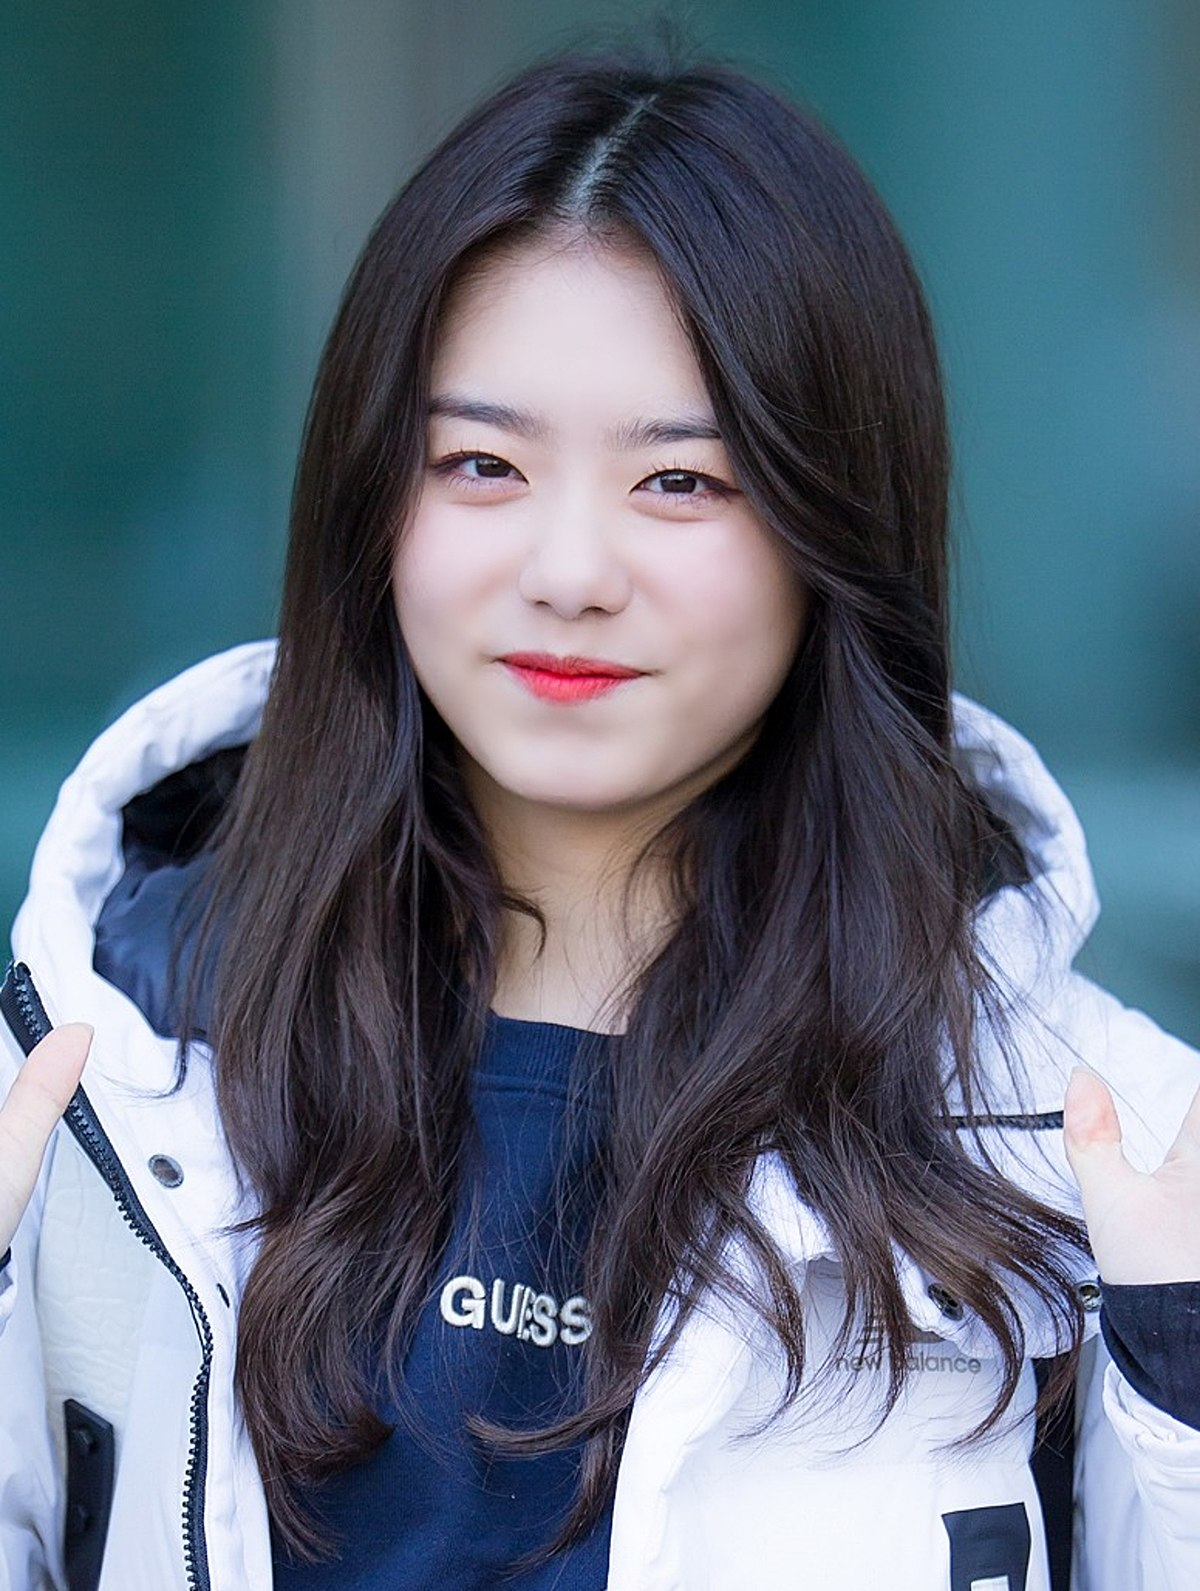 Song ji hyo sex scenes - 1 2